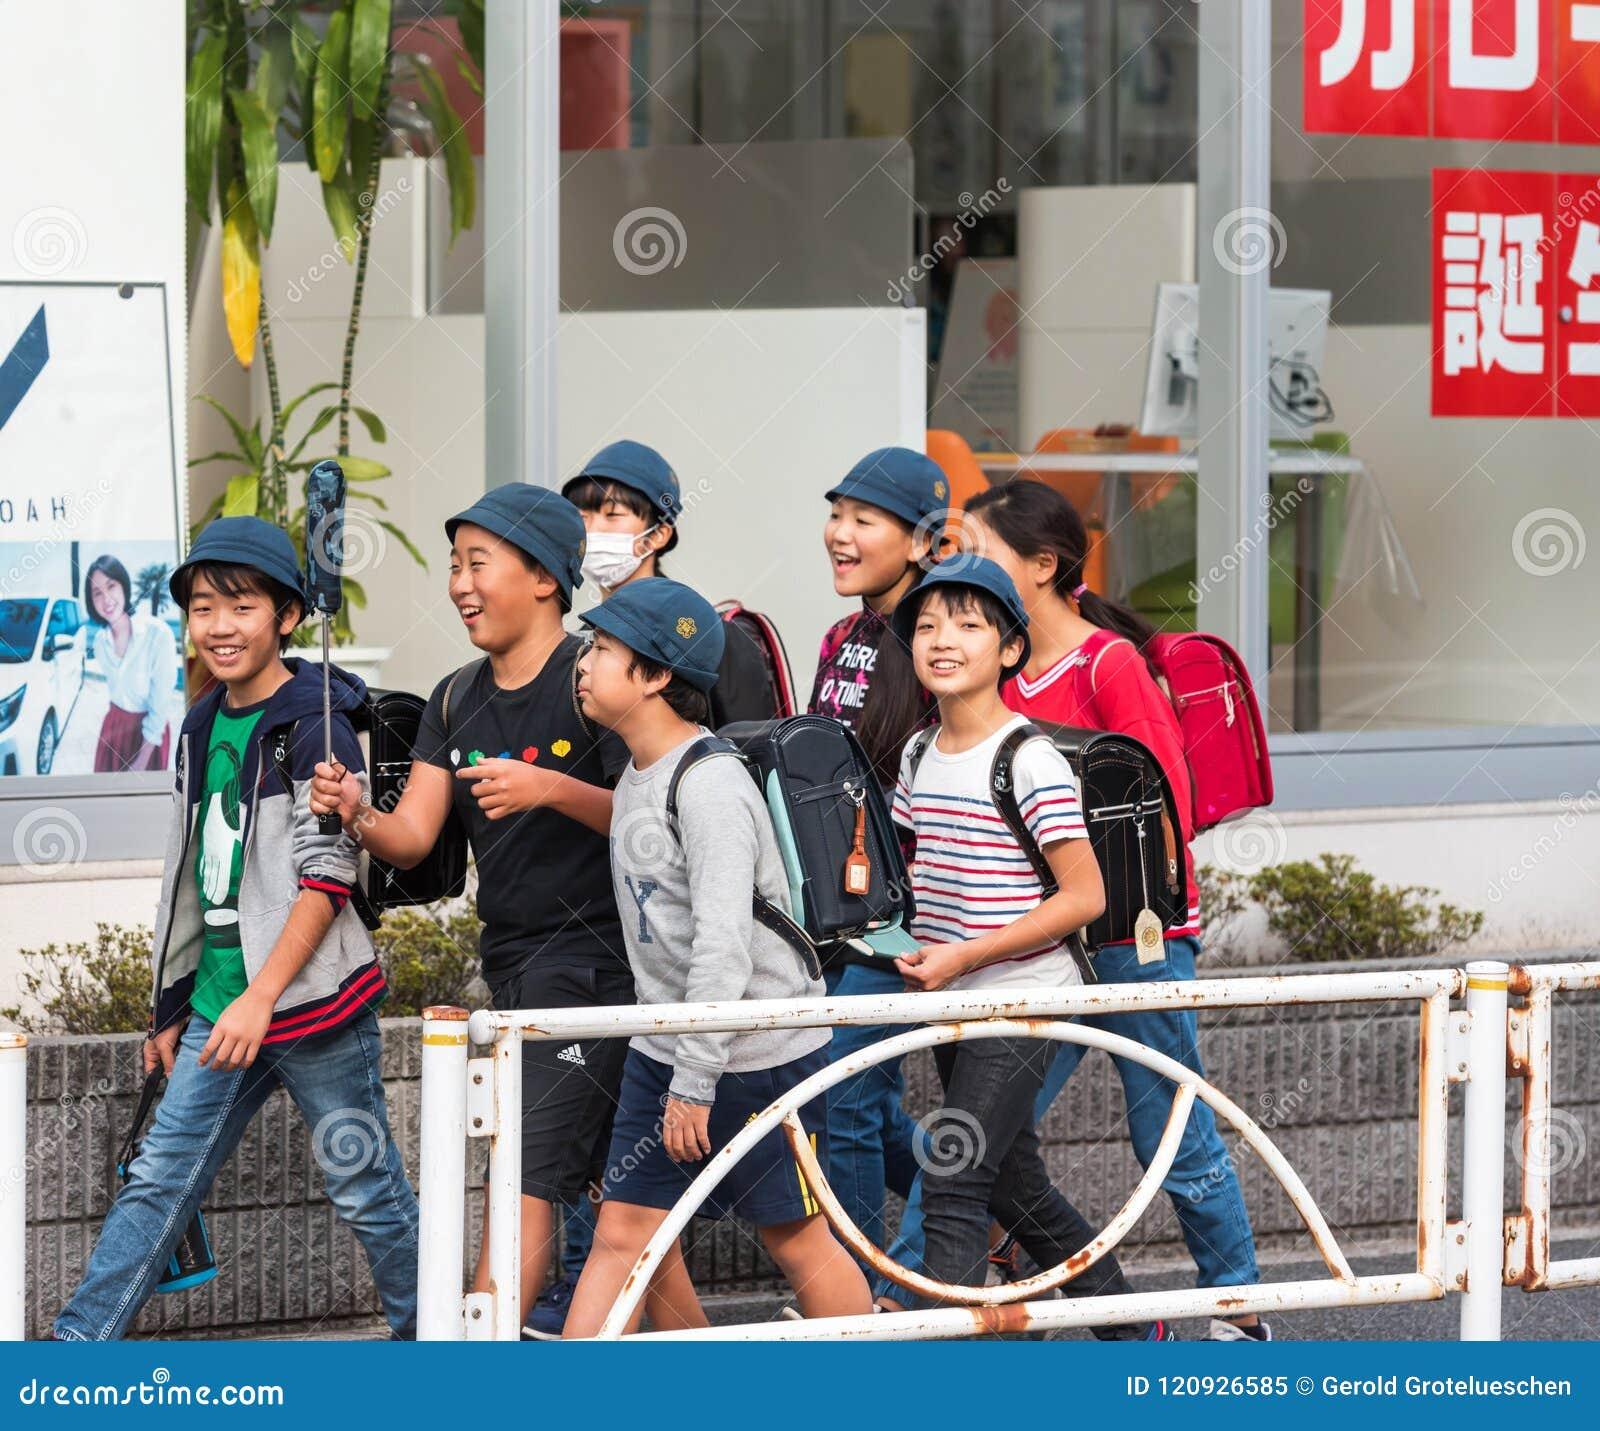 TOKYO, JAPAN - NOVEMBER 7, 2017: Group of children on a city street.